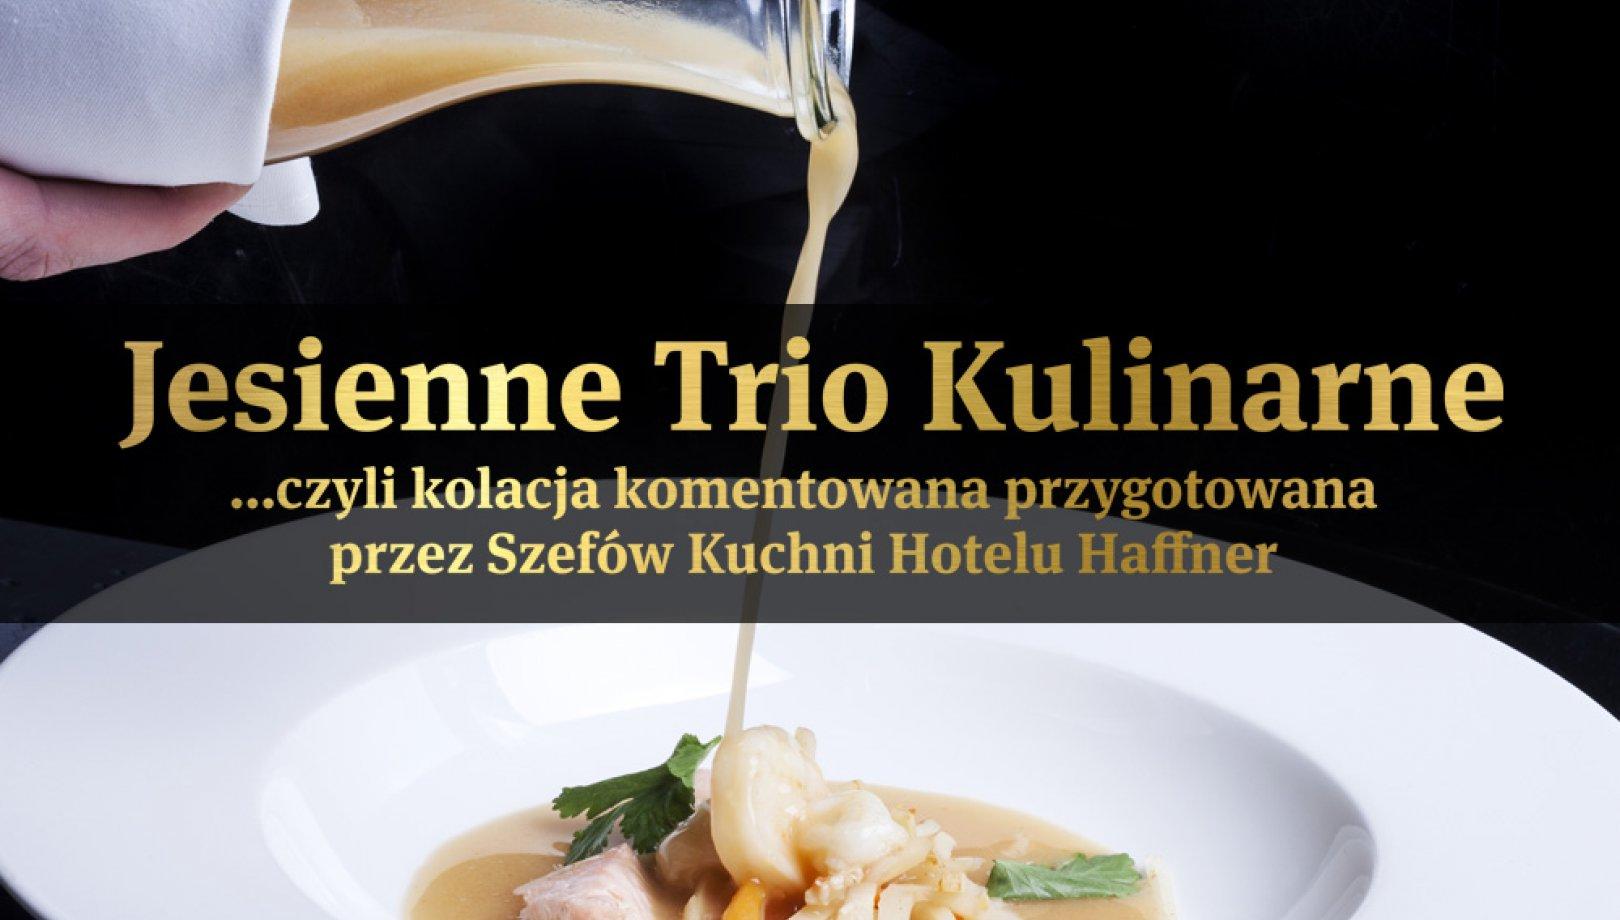 Jesienne trio kulinarne